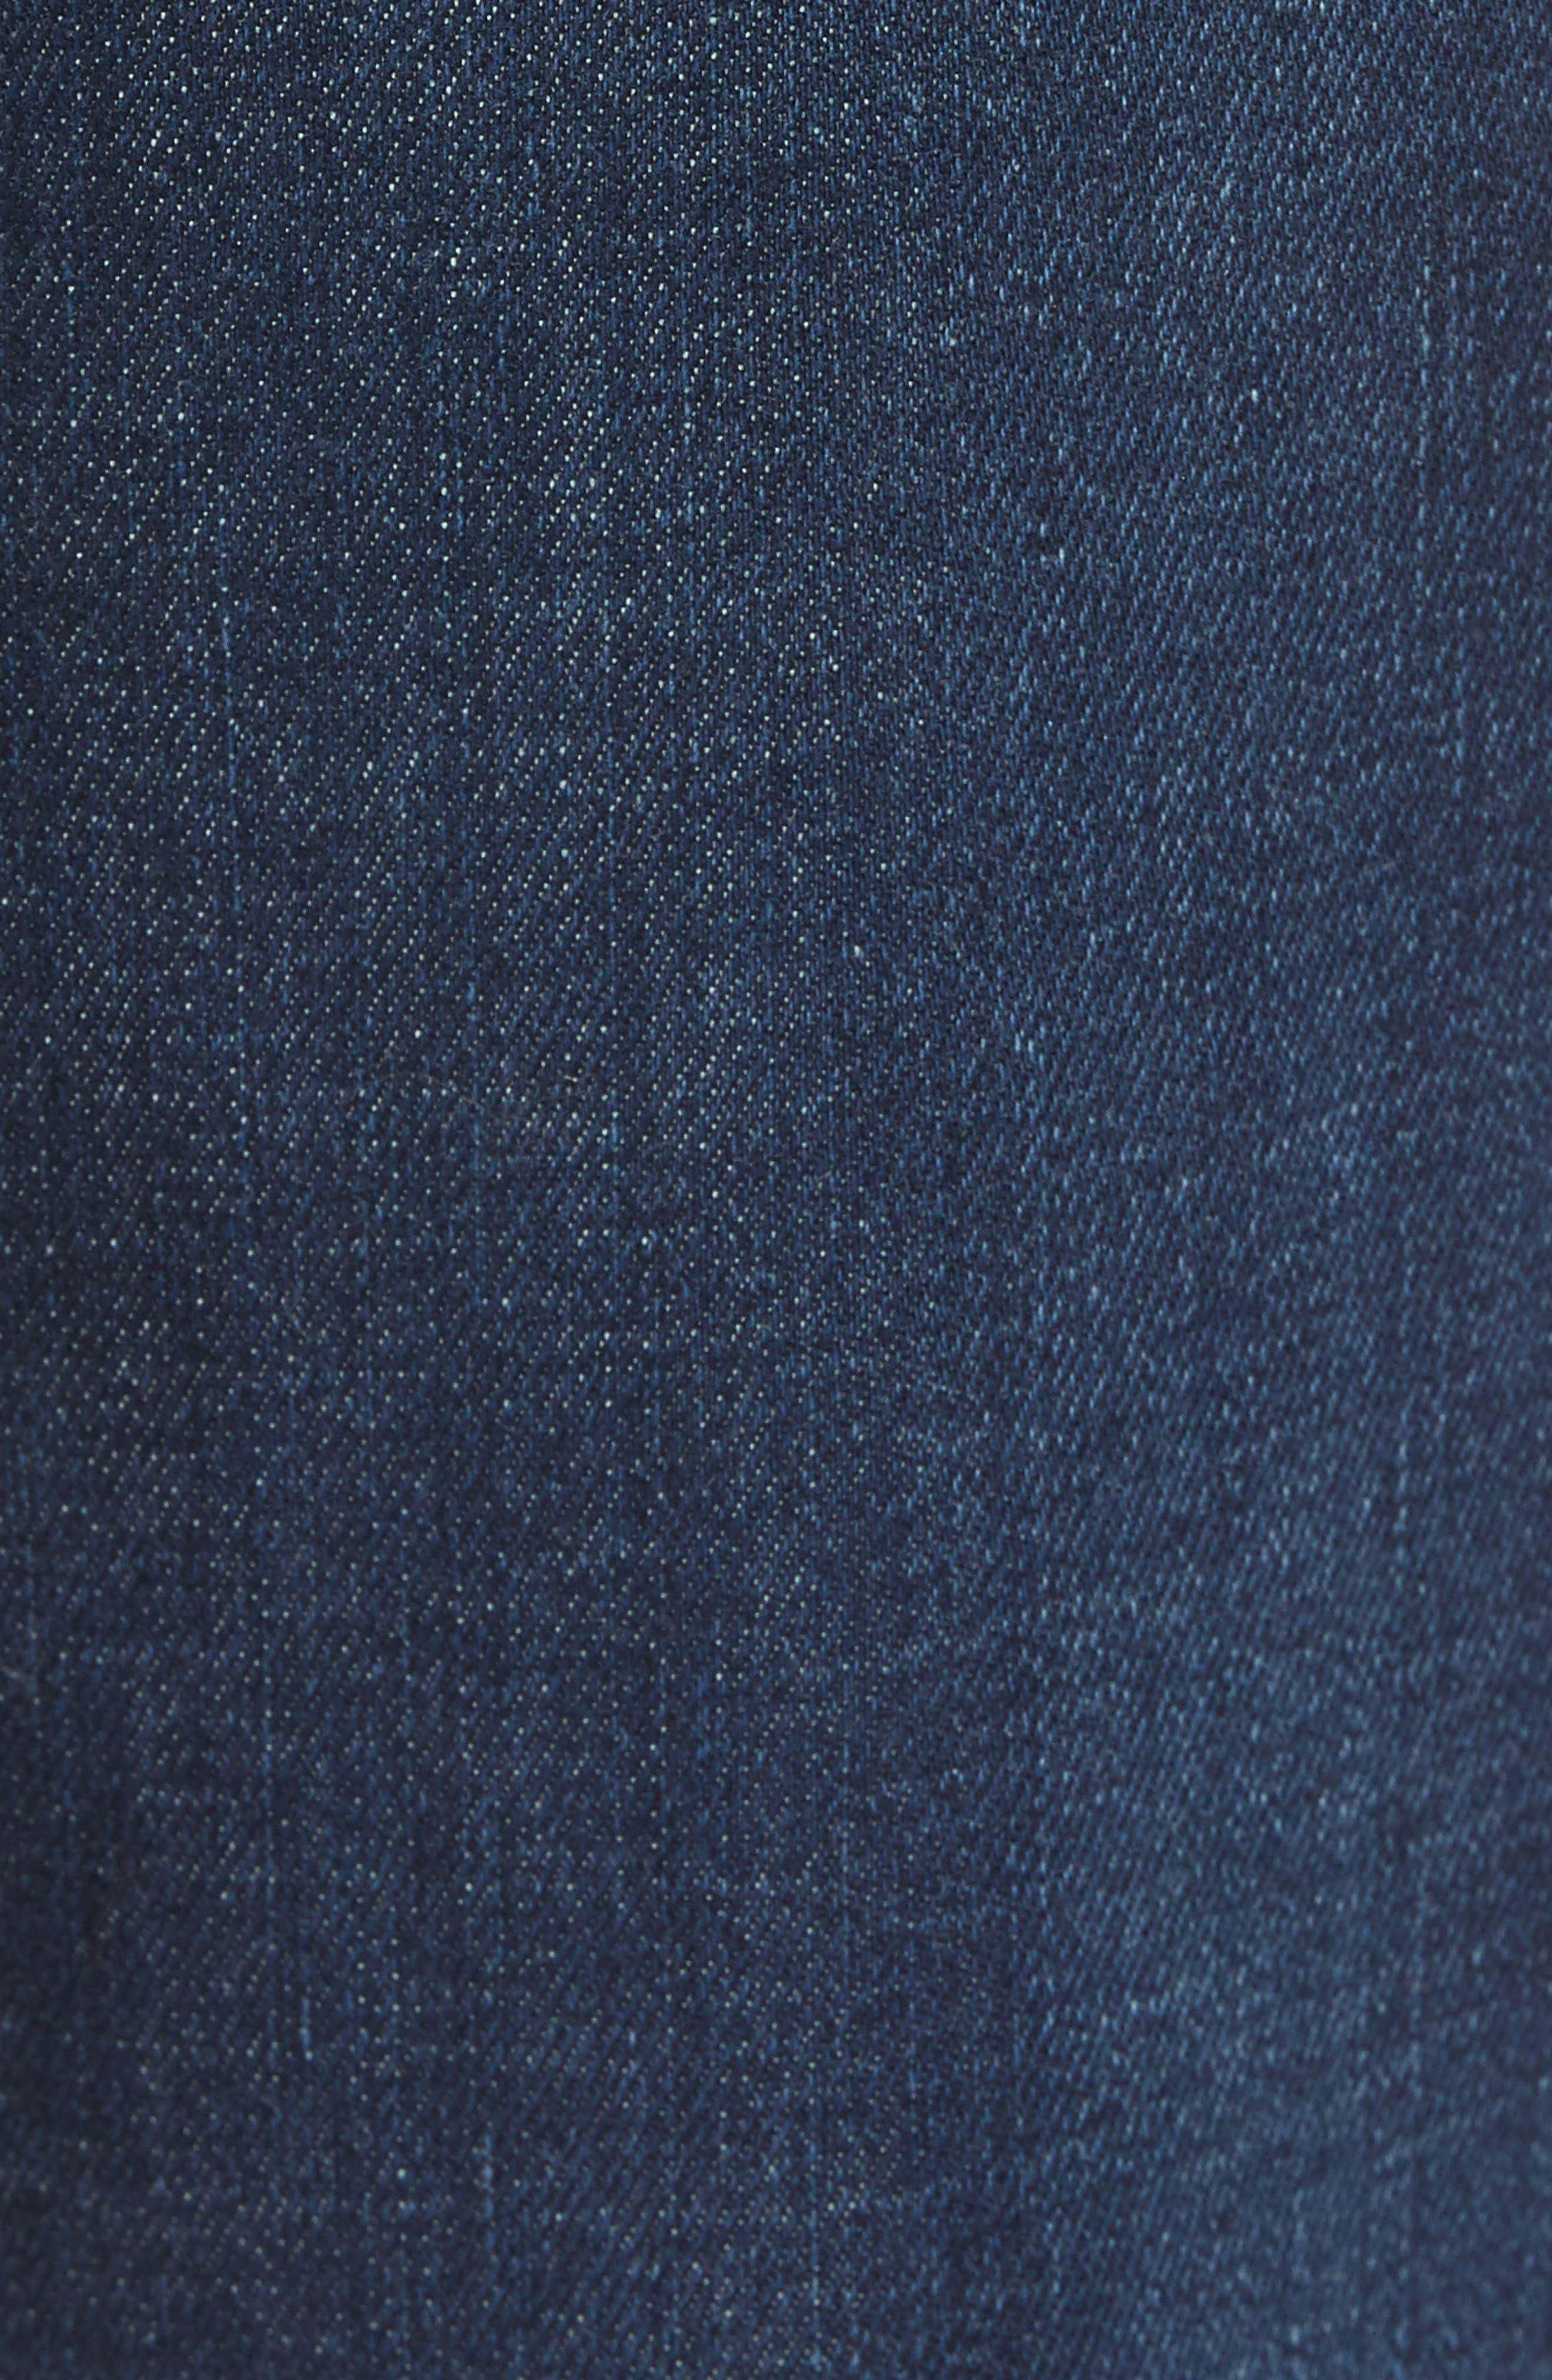 Blake Slim Fit Jeans,                             Alternate thumbnail 5, color,                             BARRY